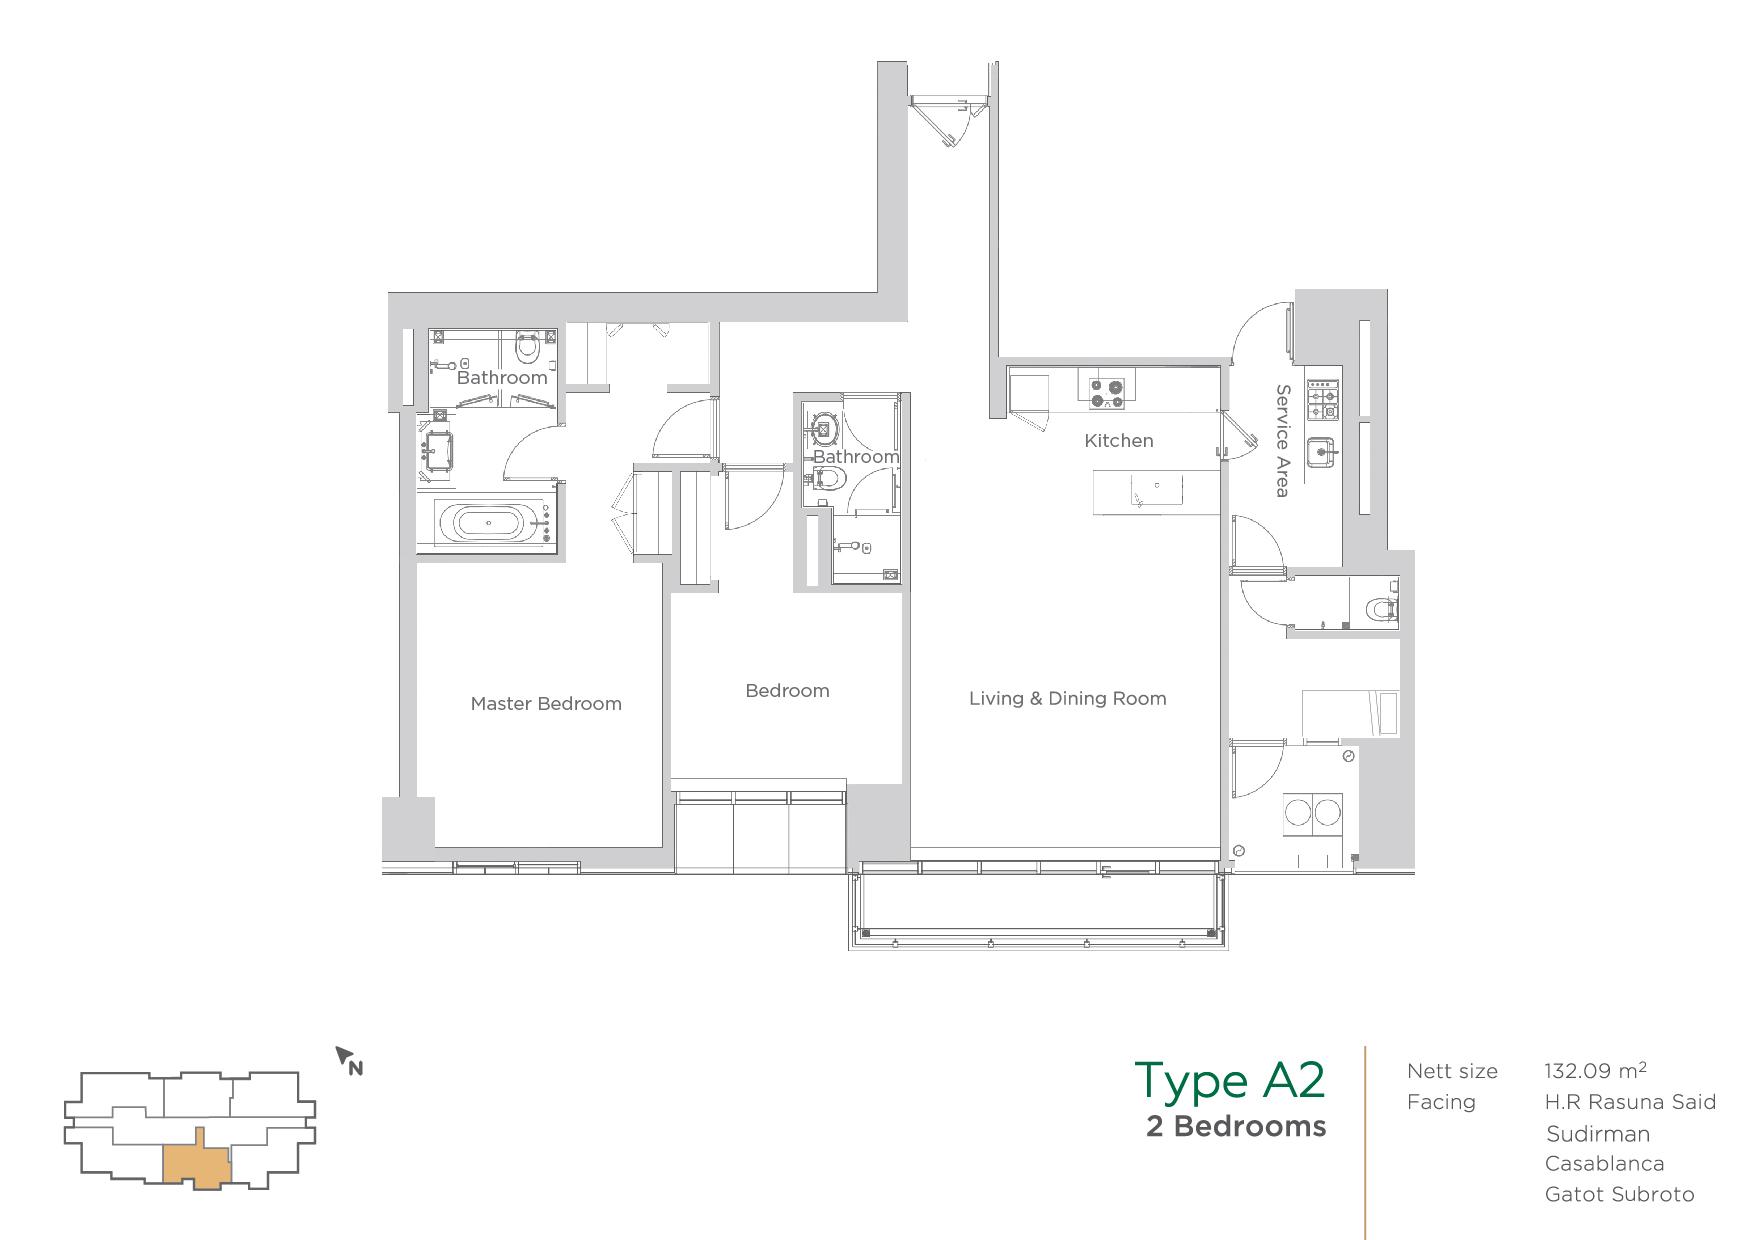 Terraverde layout type A2